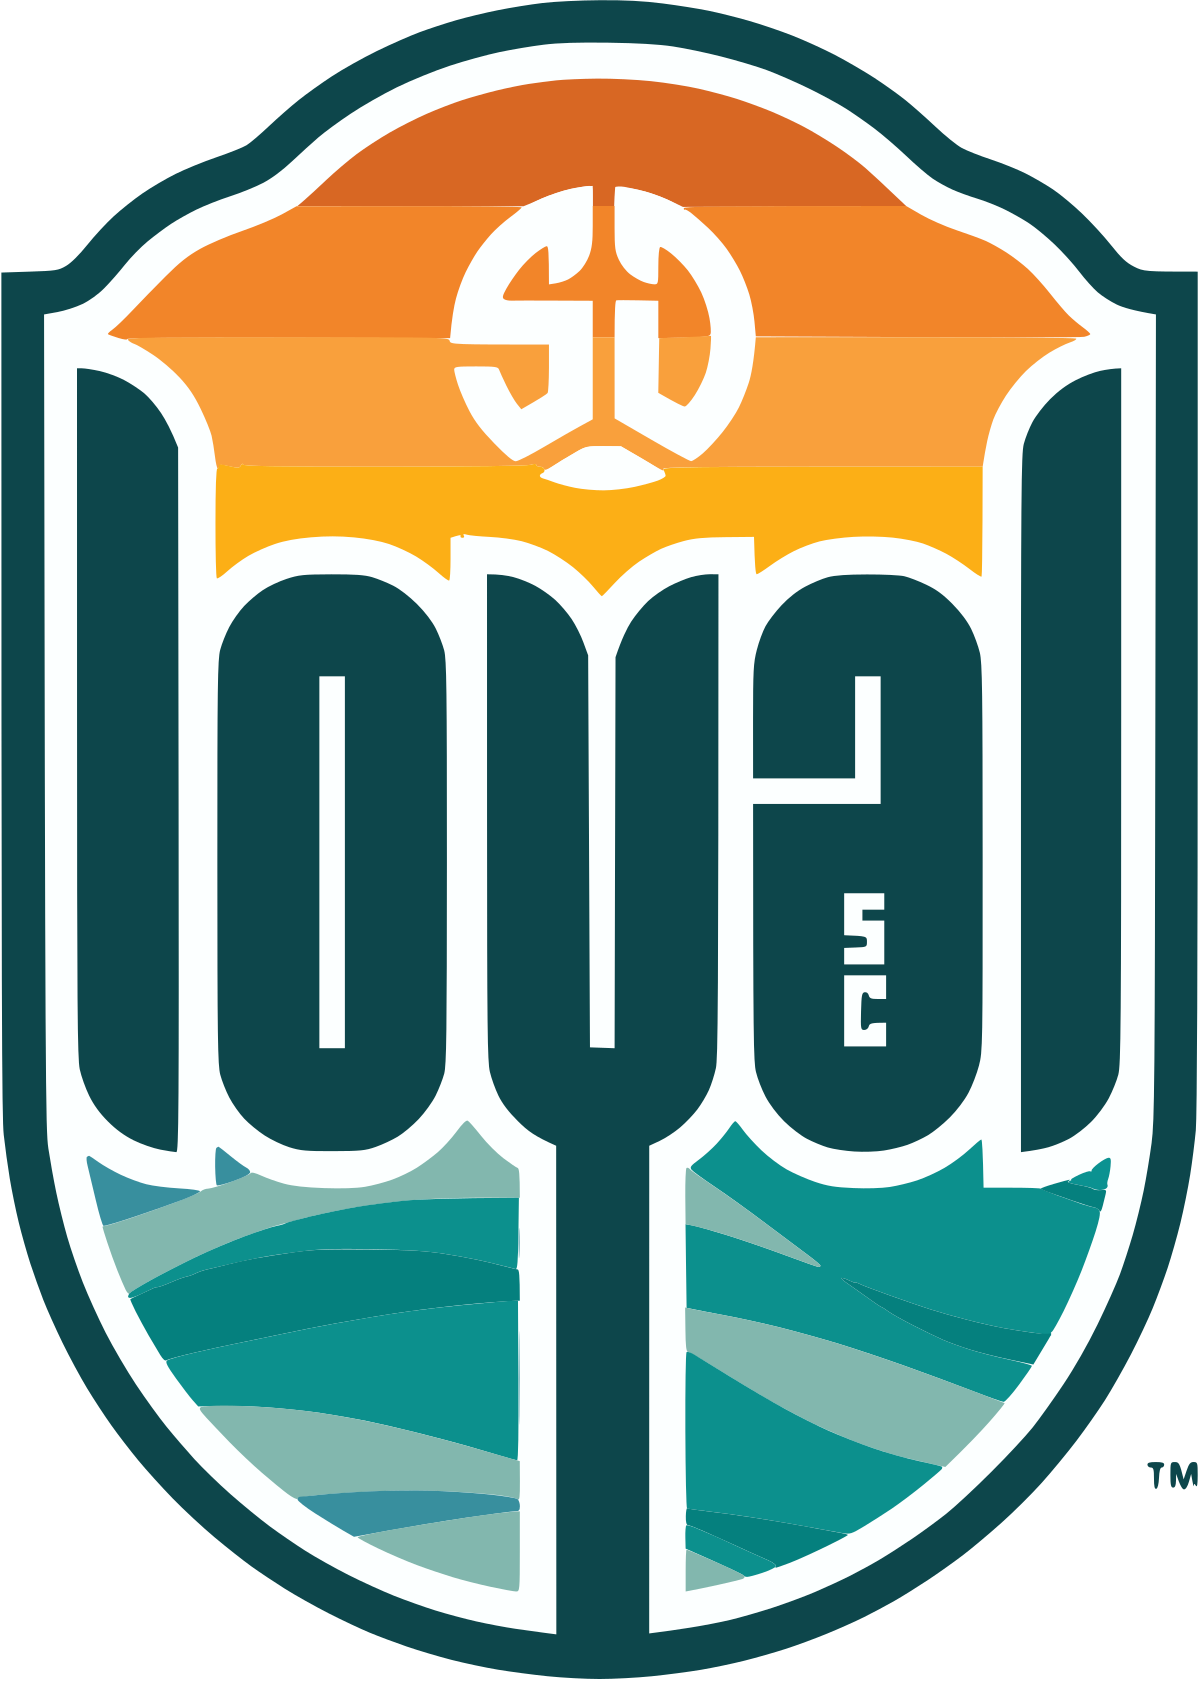 San Diego Loyal Sc Logo Logos Sports Logo Sport Team Logos